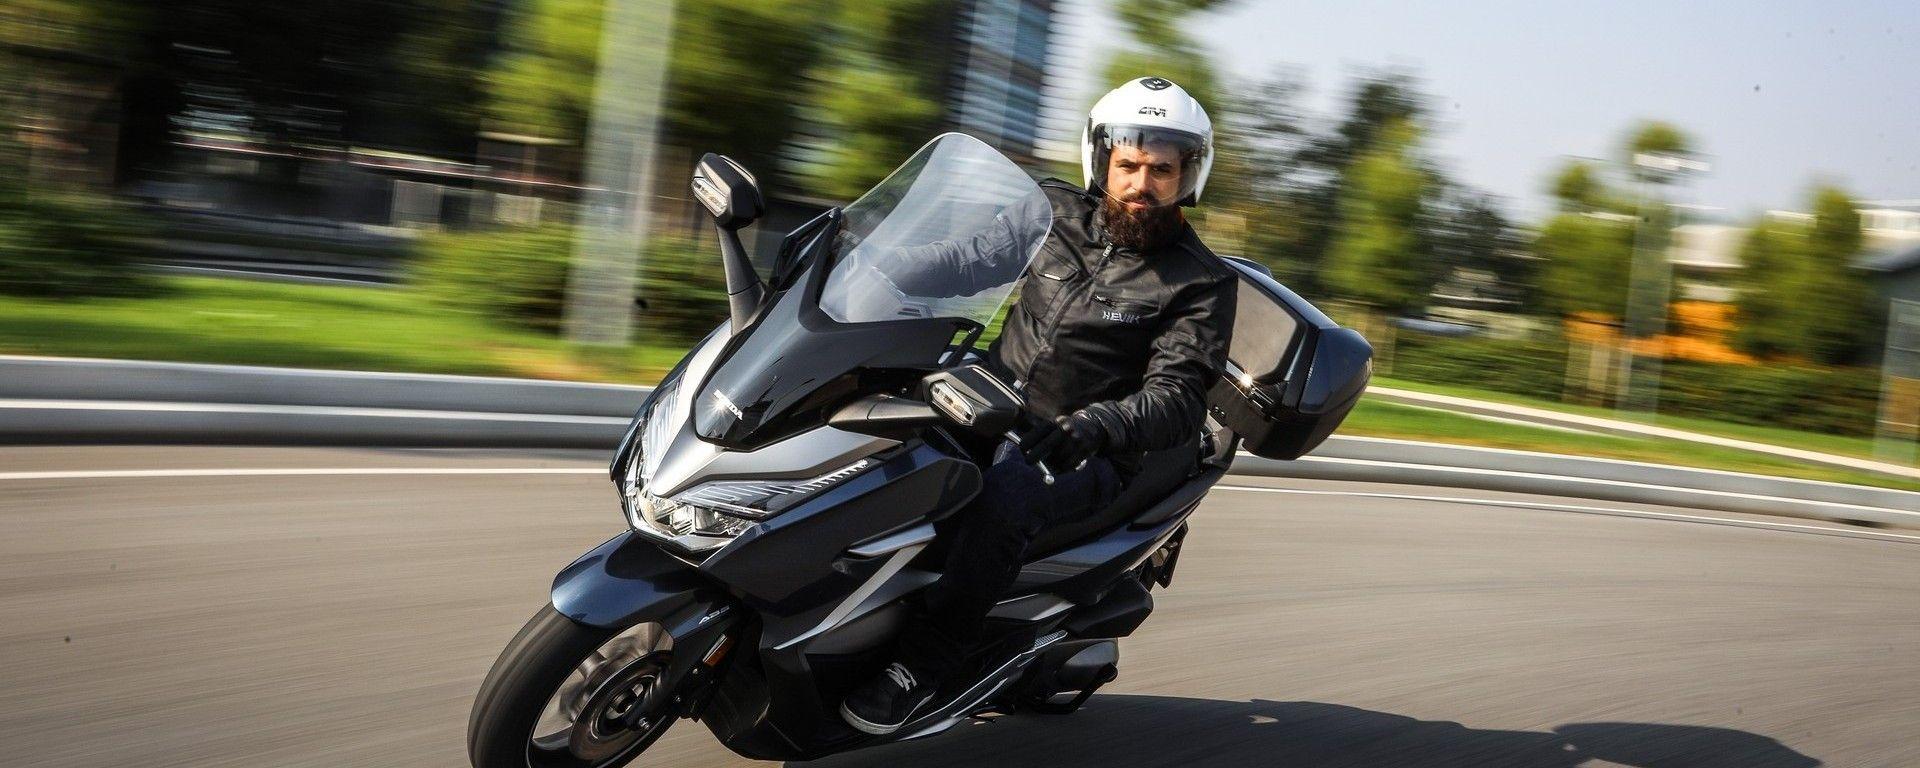 L'Honda Forza 300 a breve verrà affiancato da un maxi